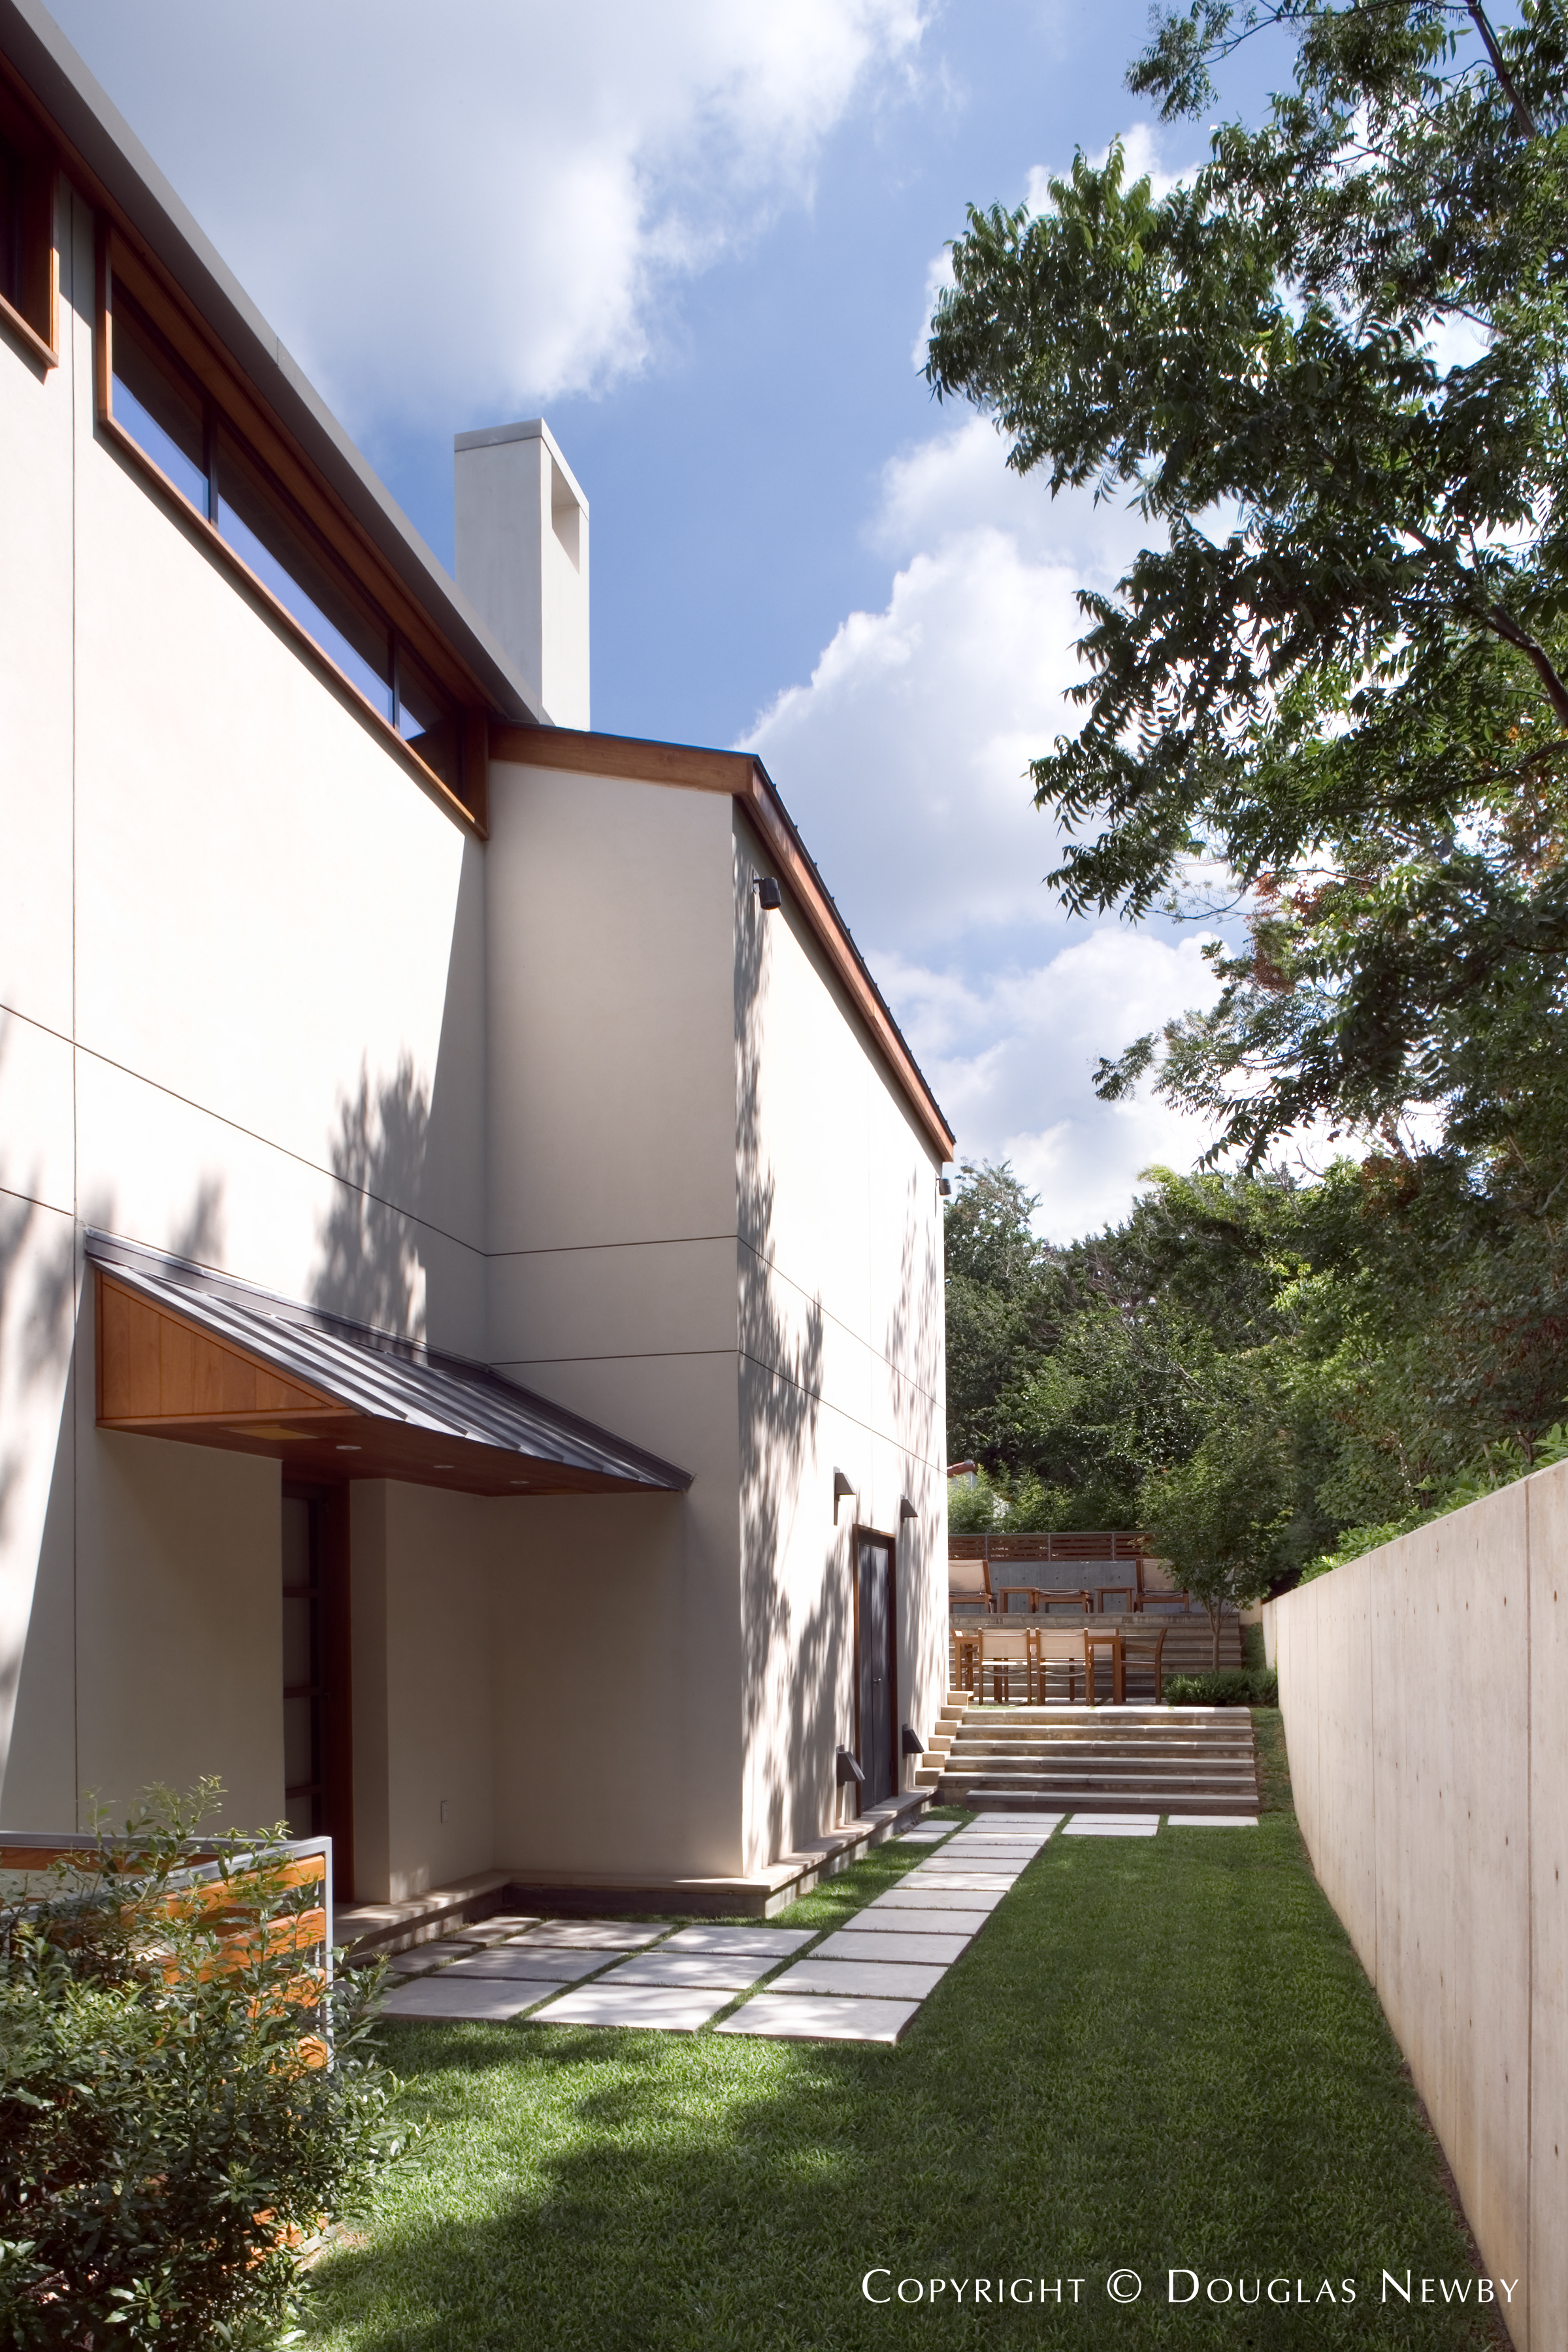 Turtle Creek Corridor Modern Home sitting on 0.2 Acres